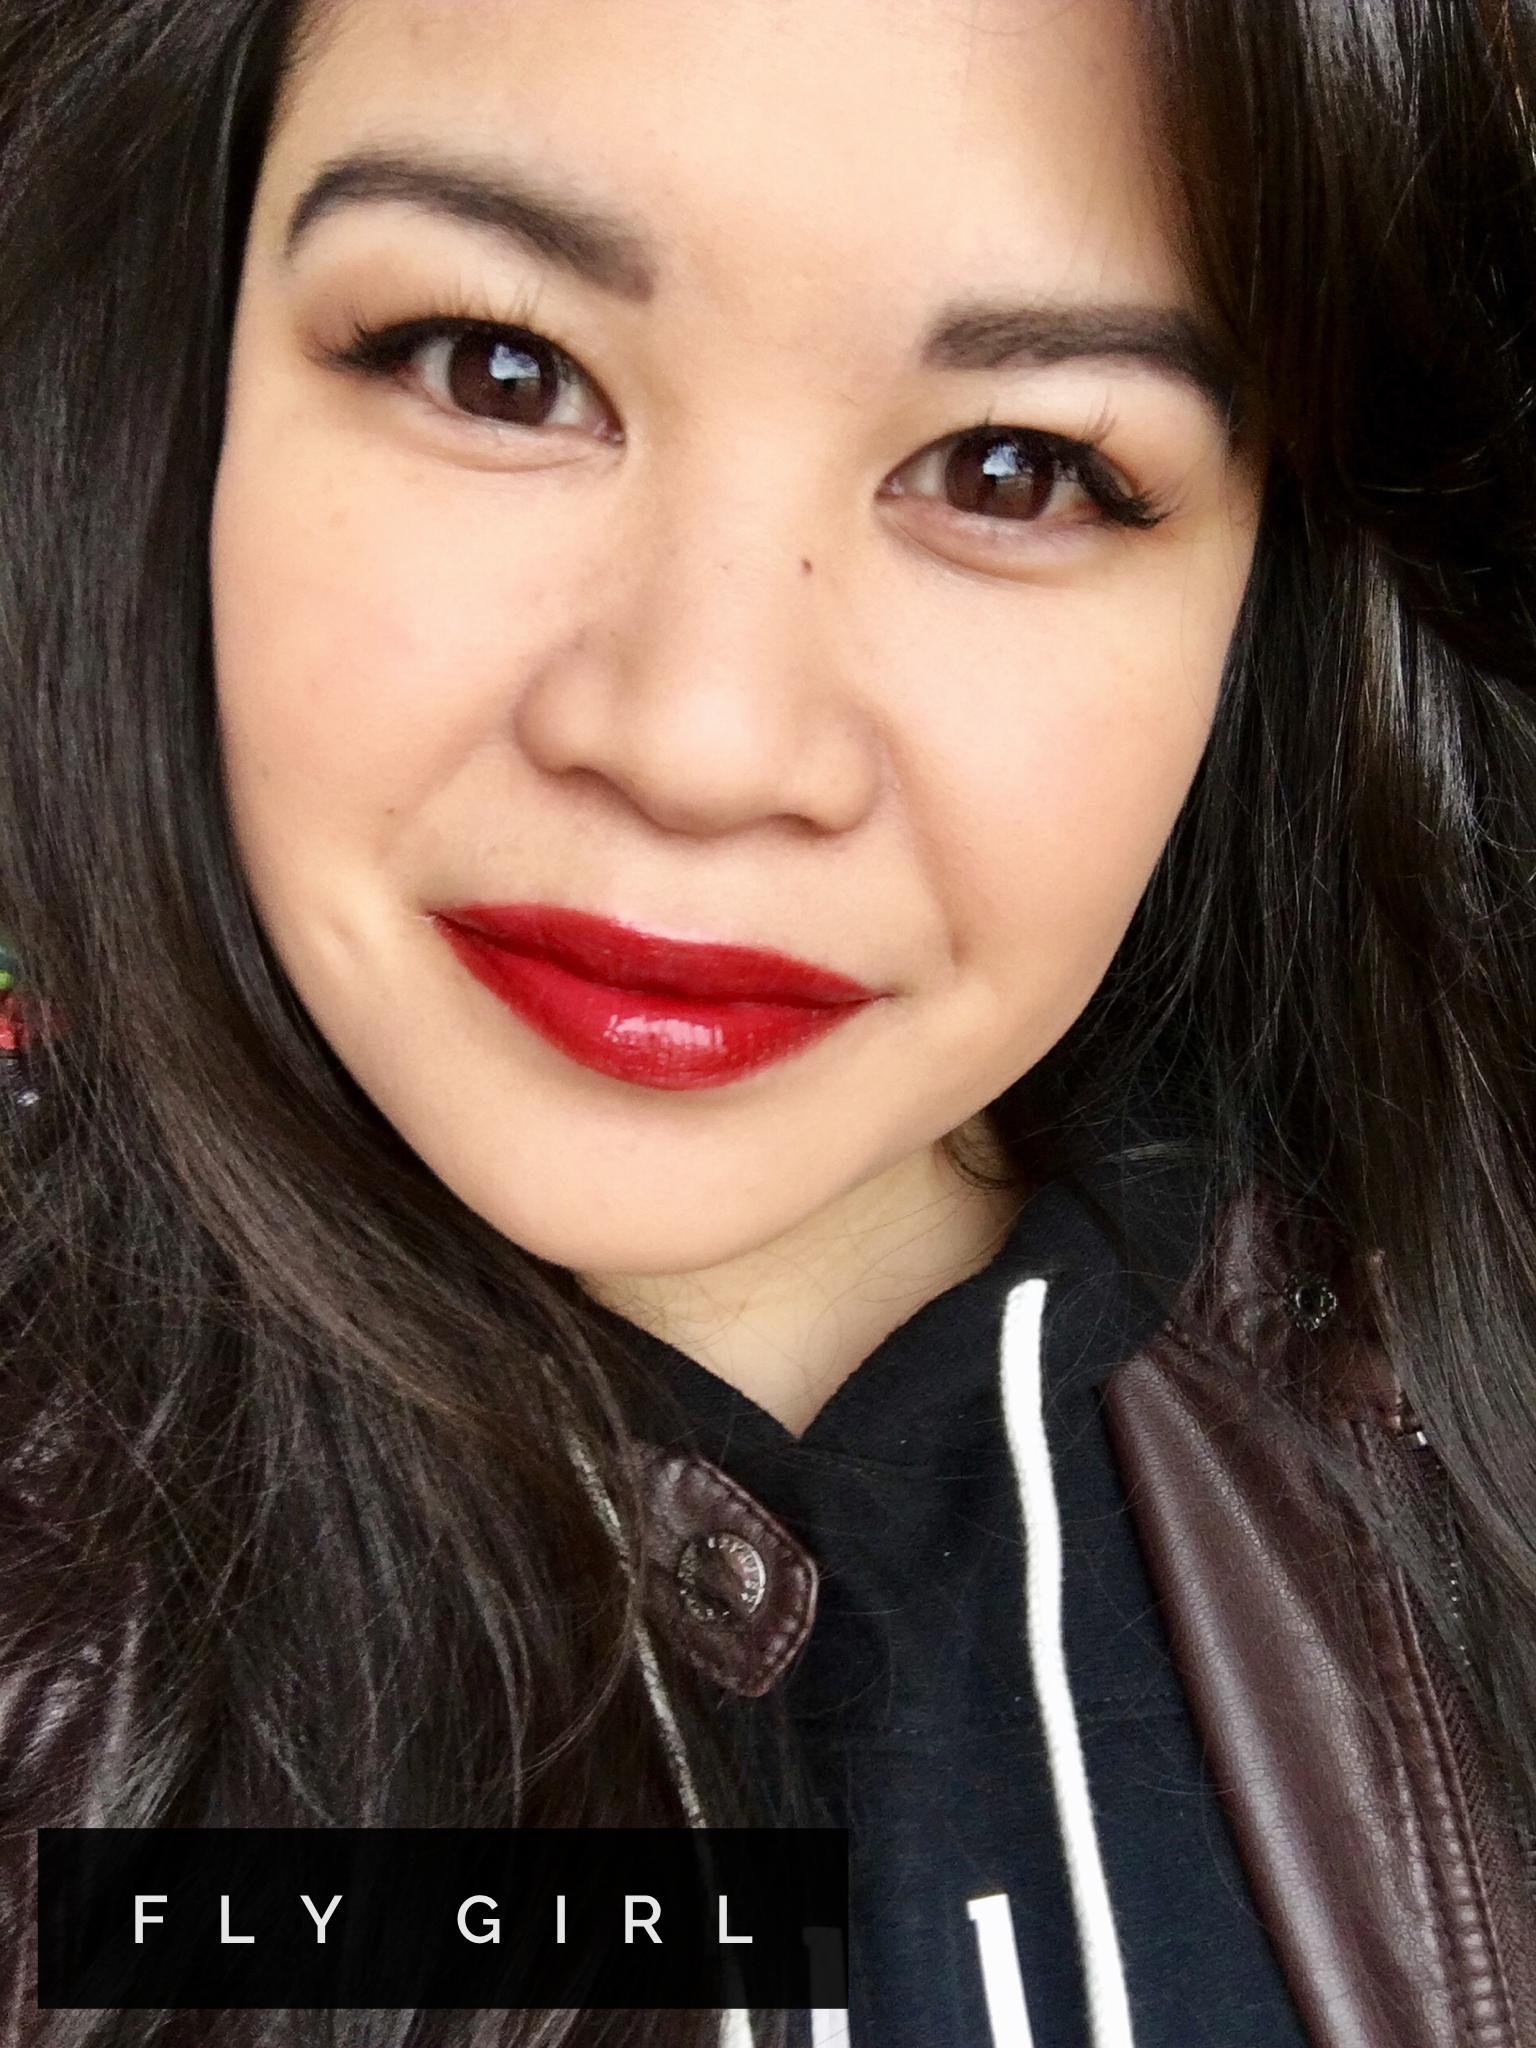 Lipsense Makeup: Fly Girl Long Lasting LipSense. These Lips Don't Lie